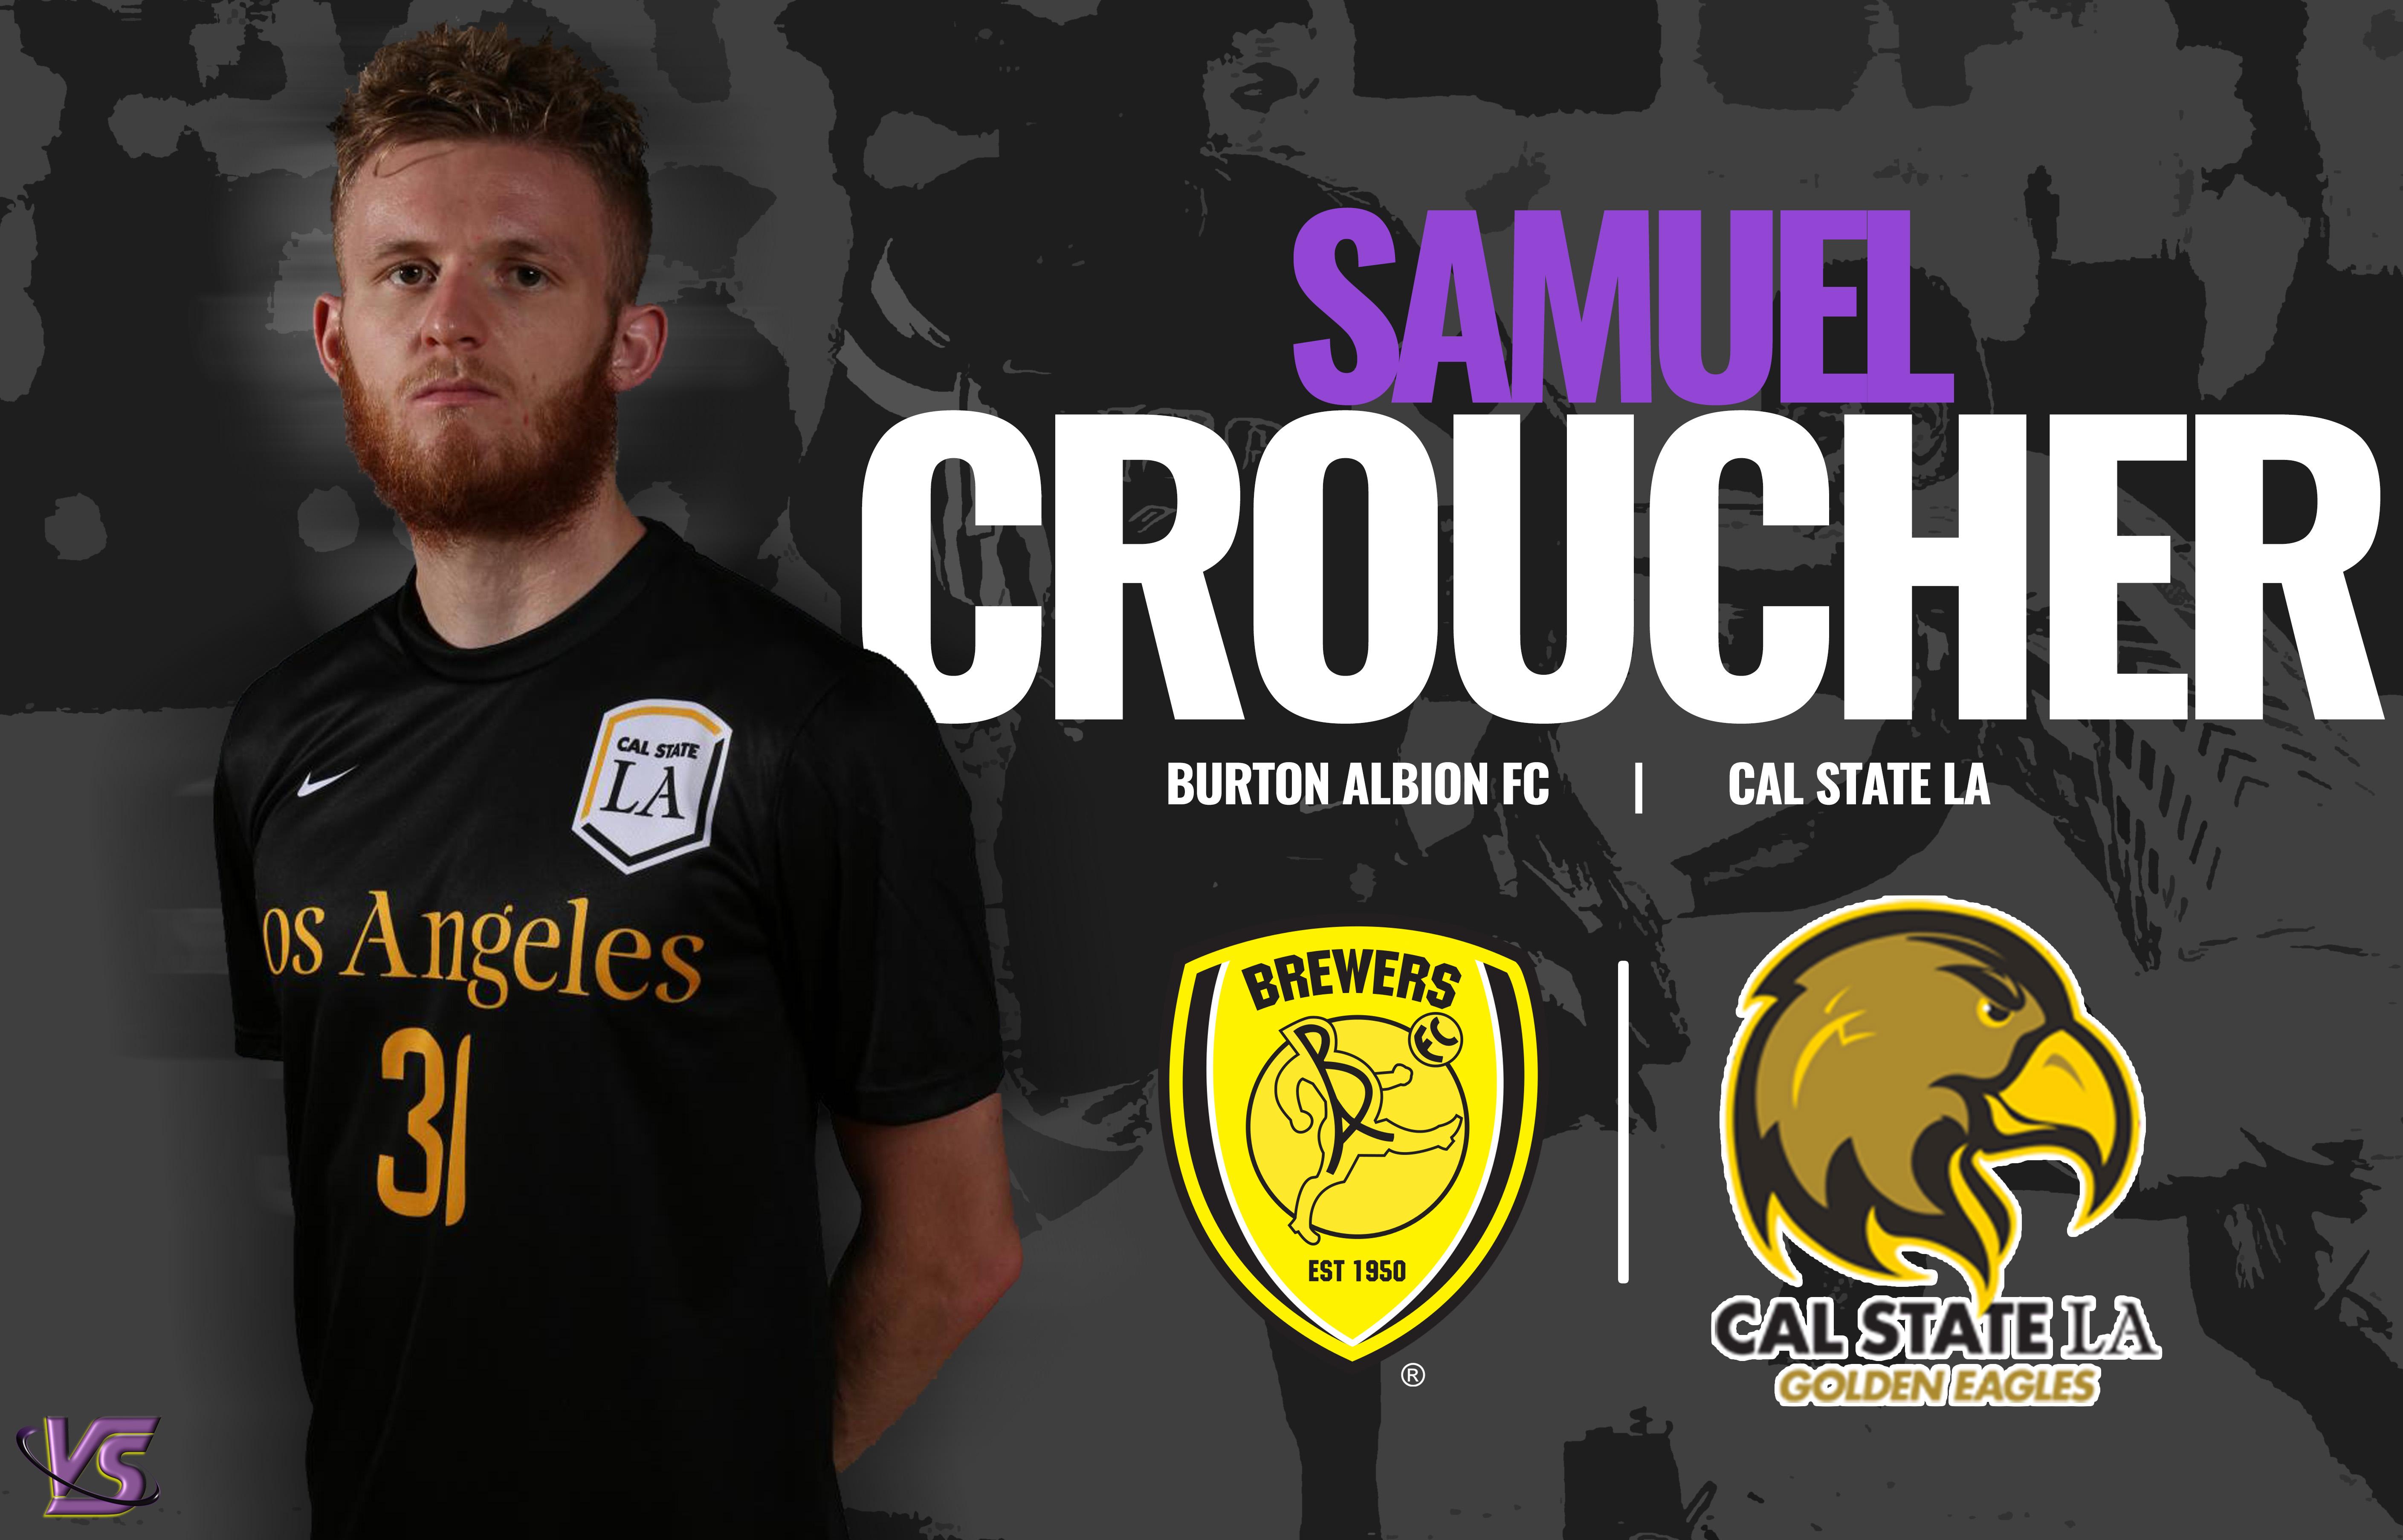 Sam Croucher 2013